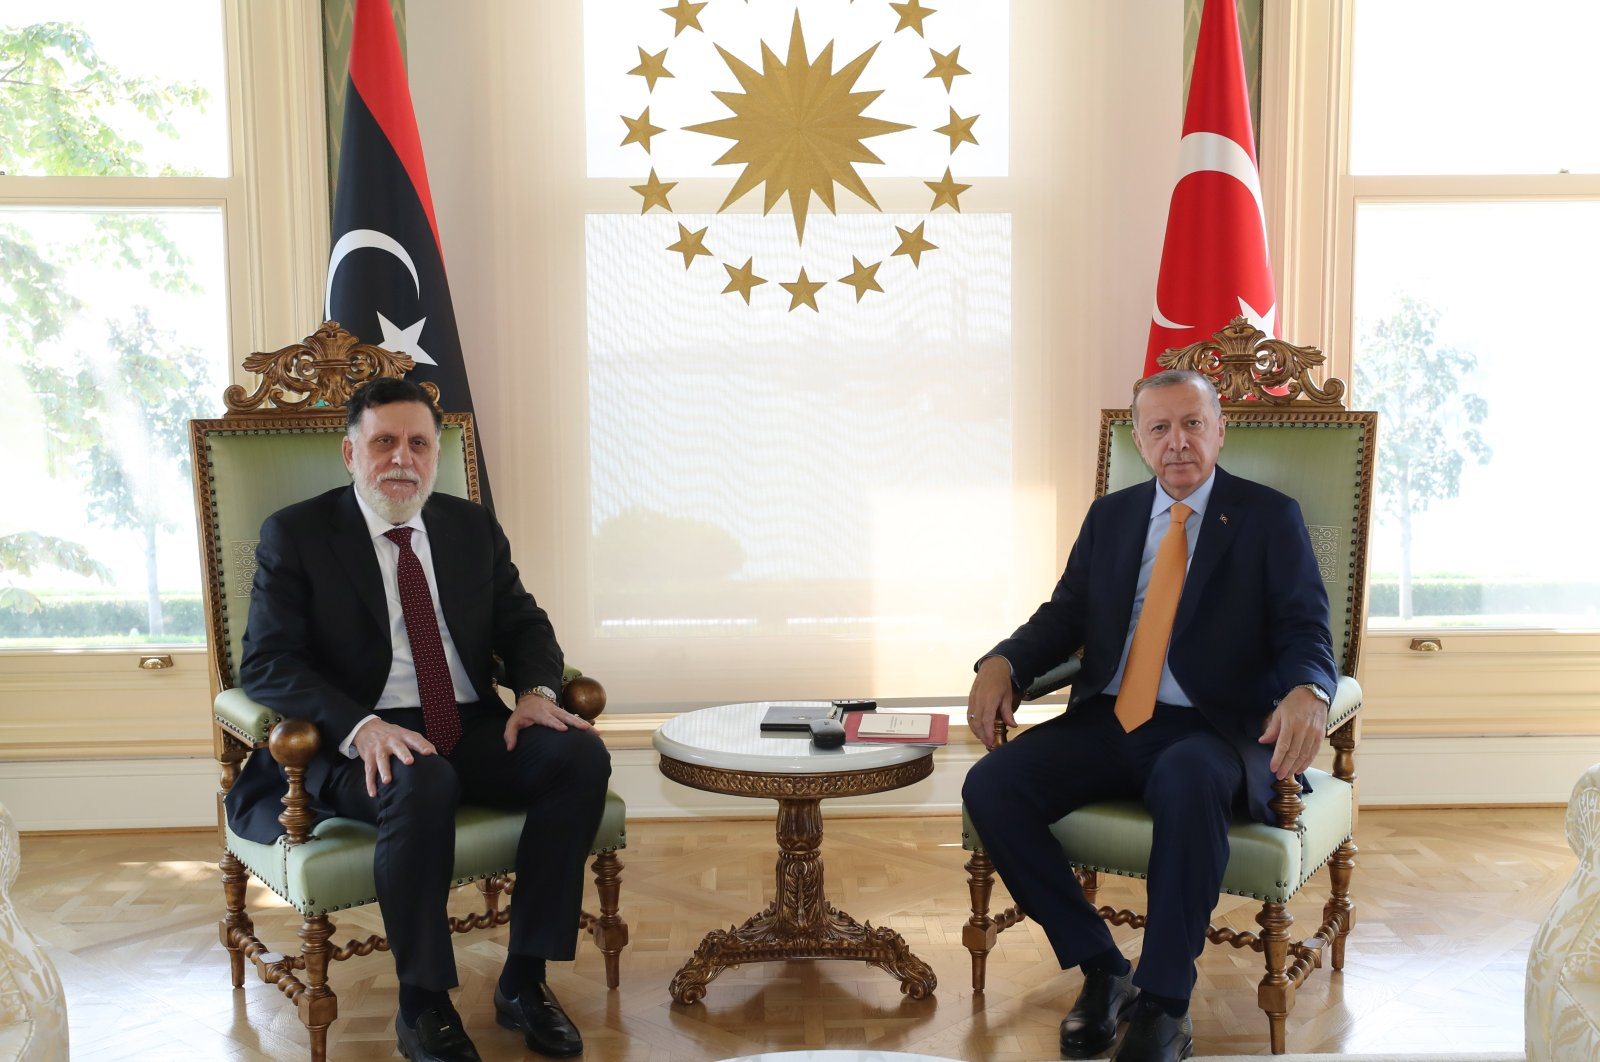 President Recep Tayyip Erdoğan receives Libya's Prime Minister Fayez Sarraj inIstanbul, Sep. 6, 2020. (AA Photo)